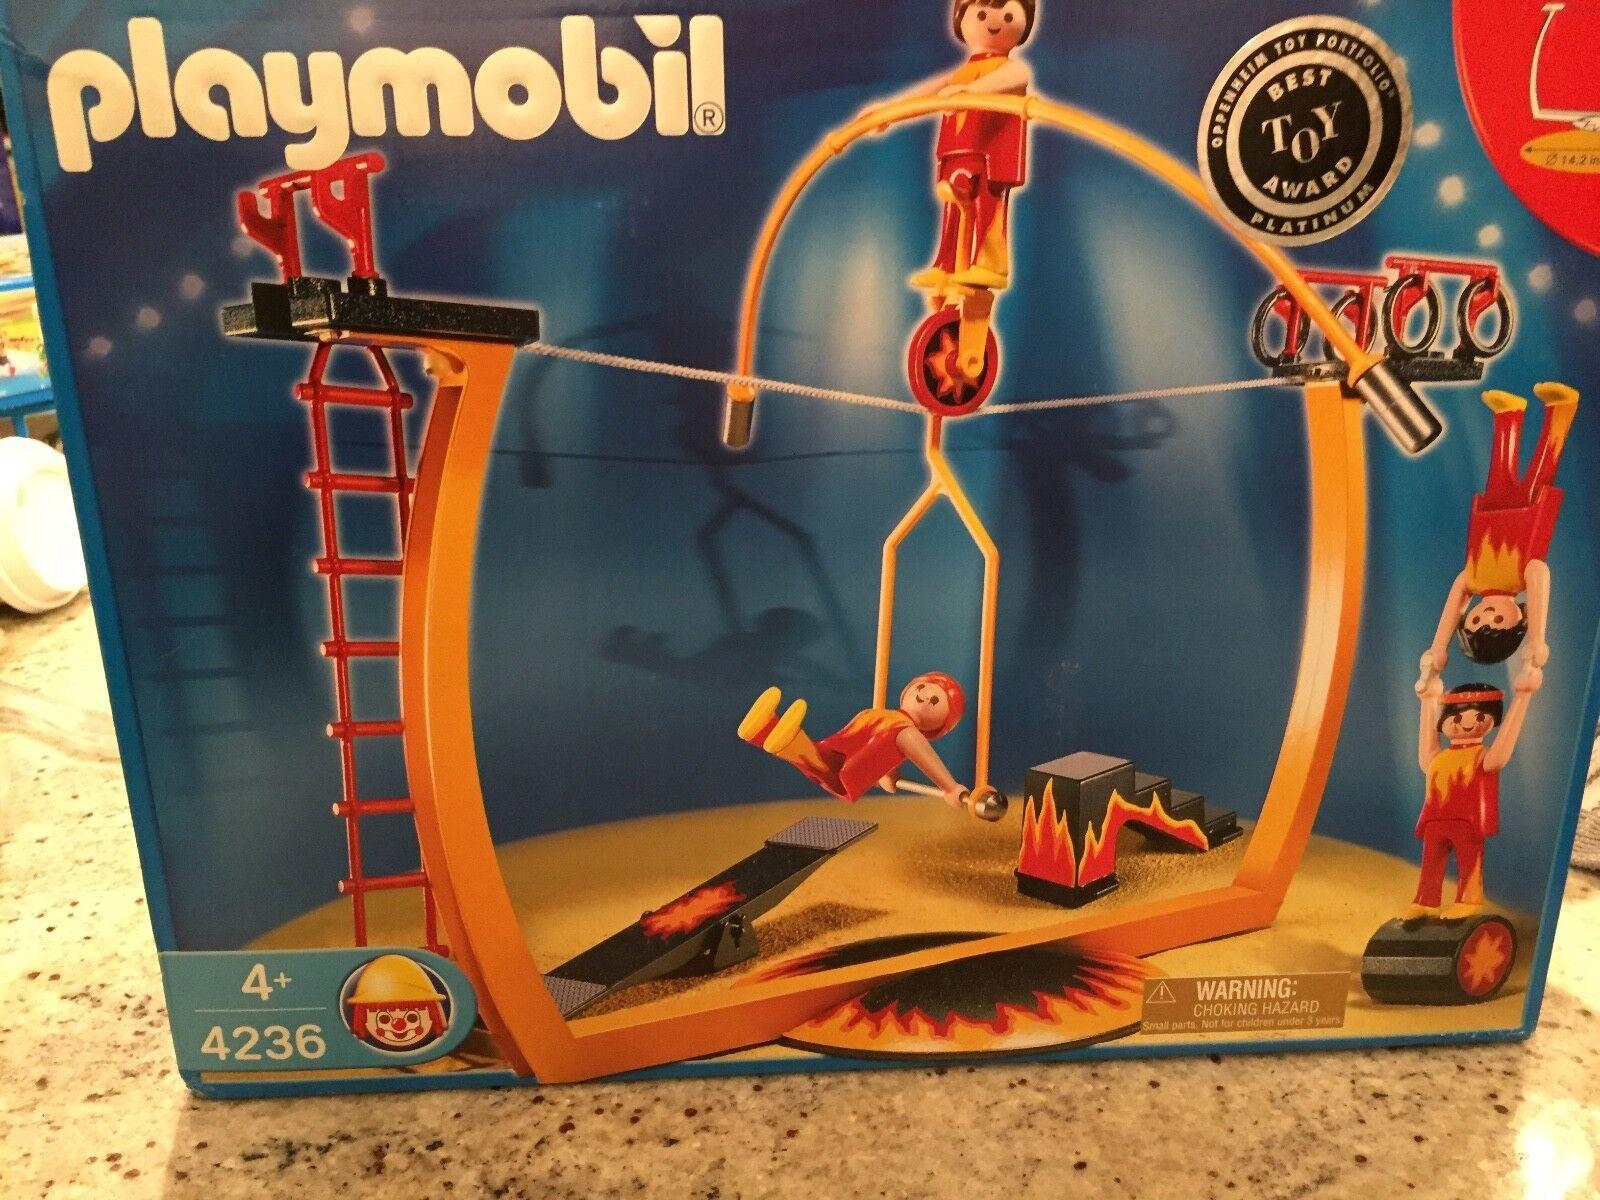 NIB - NEW NEVER OPENED Playmobil Circus Tightrope Acrobat Acrobat Acrobat Set Unicycle Set 808c79